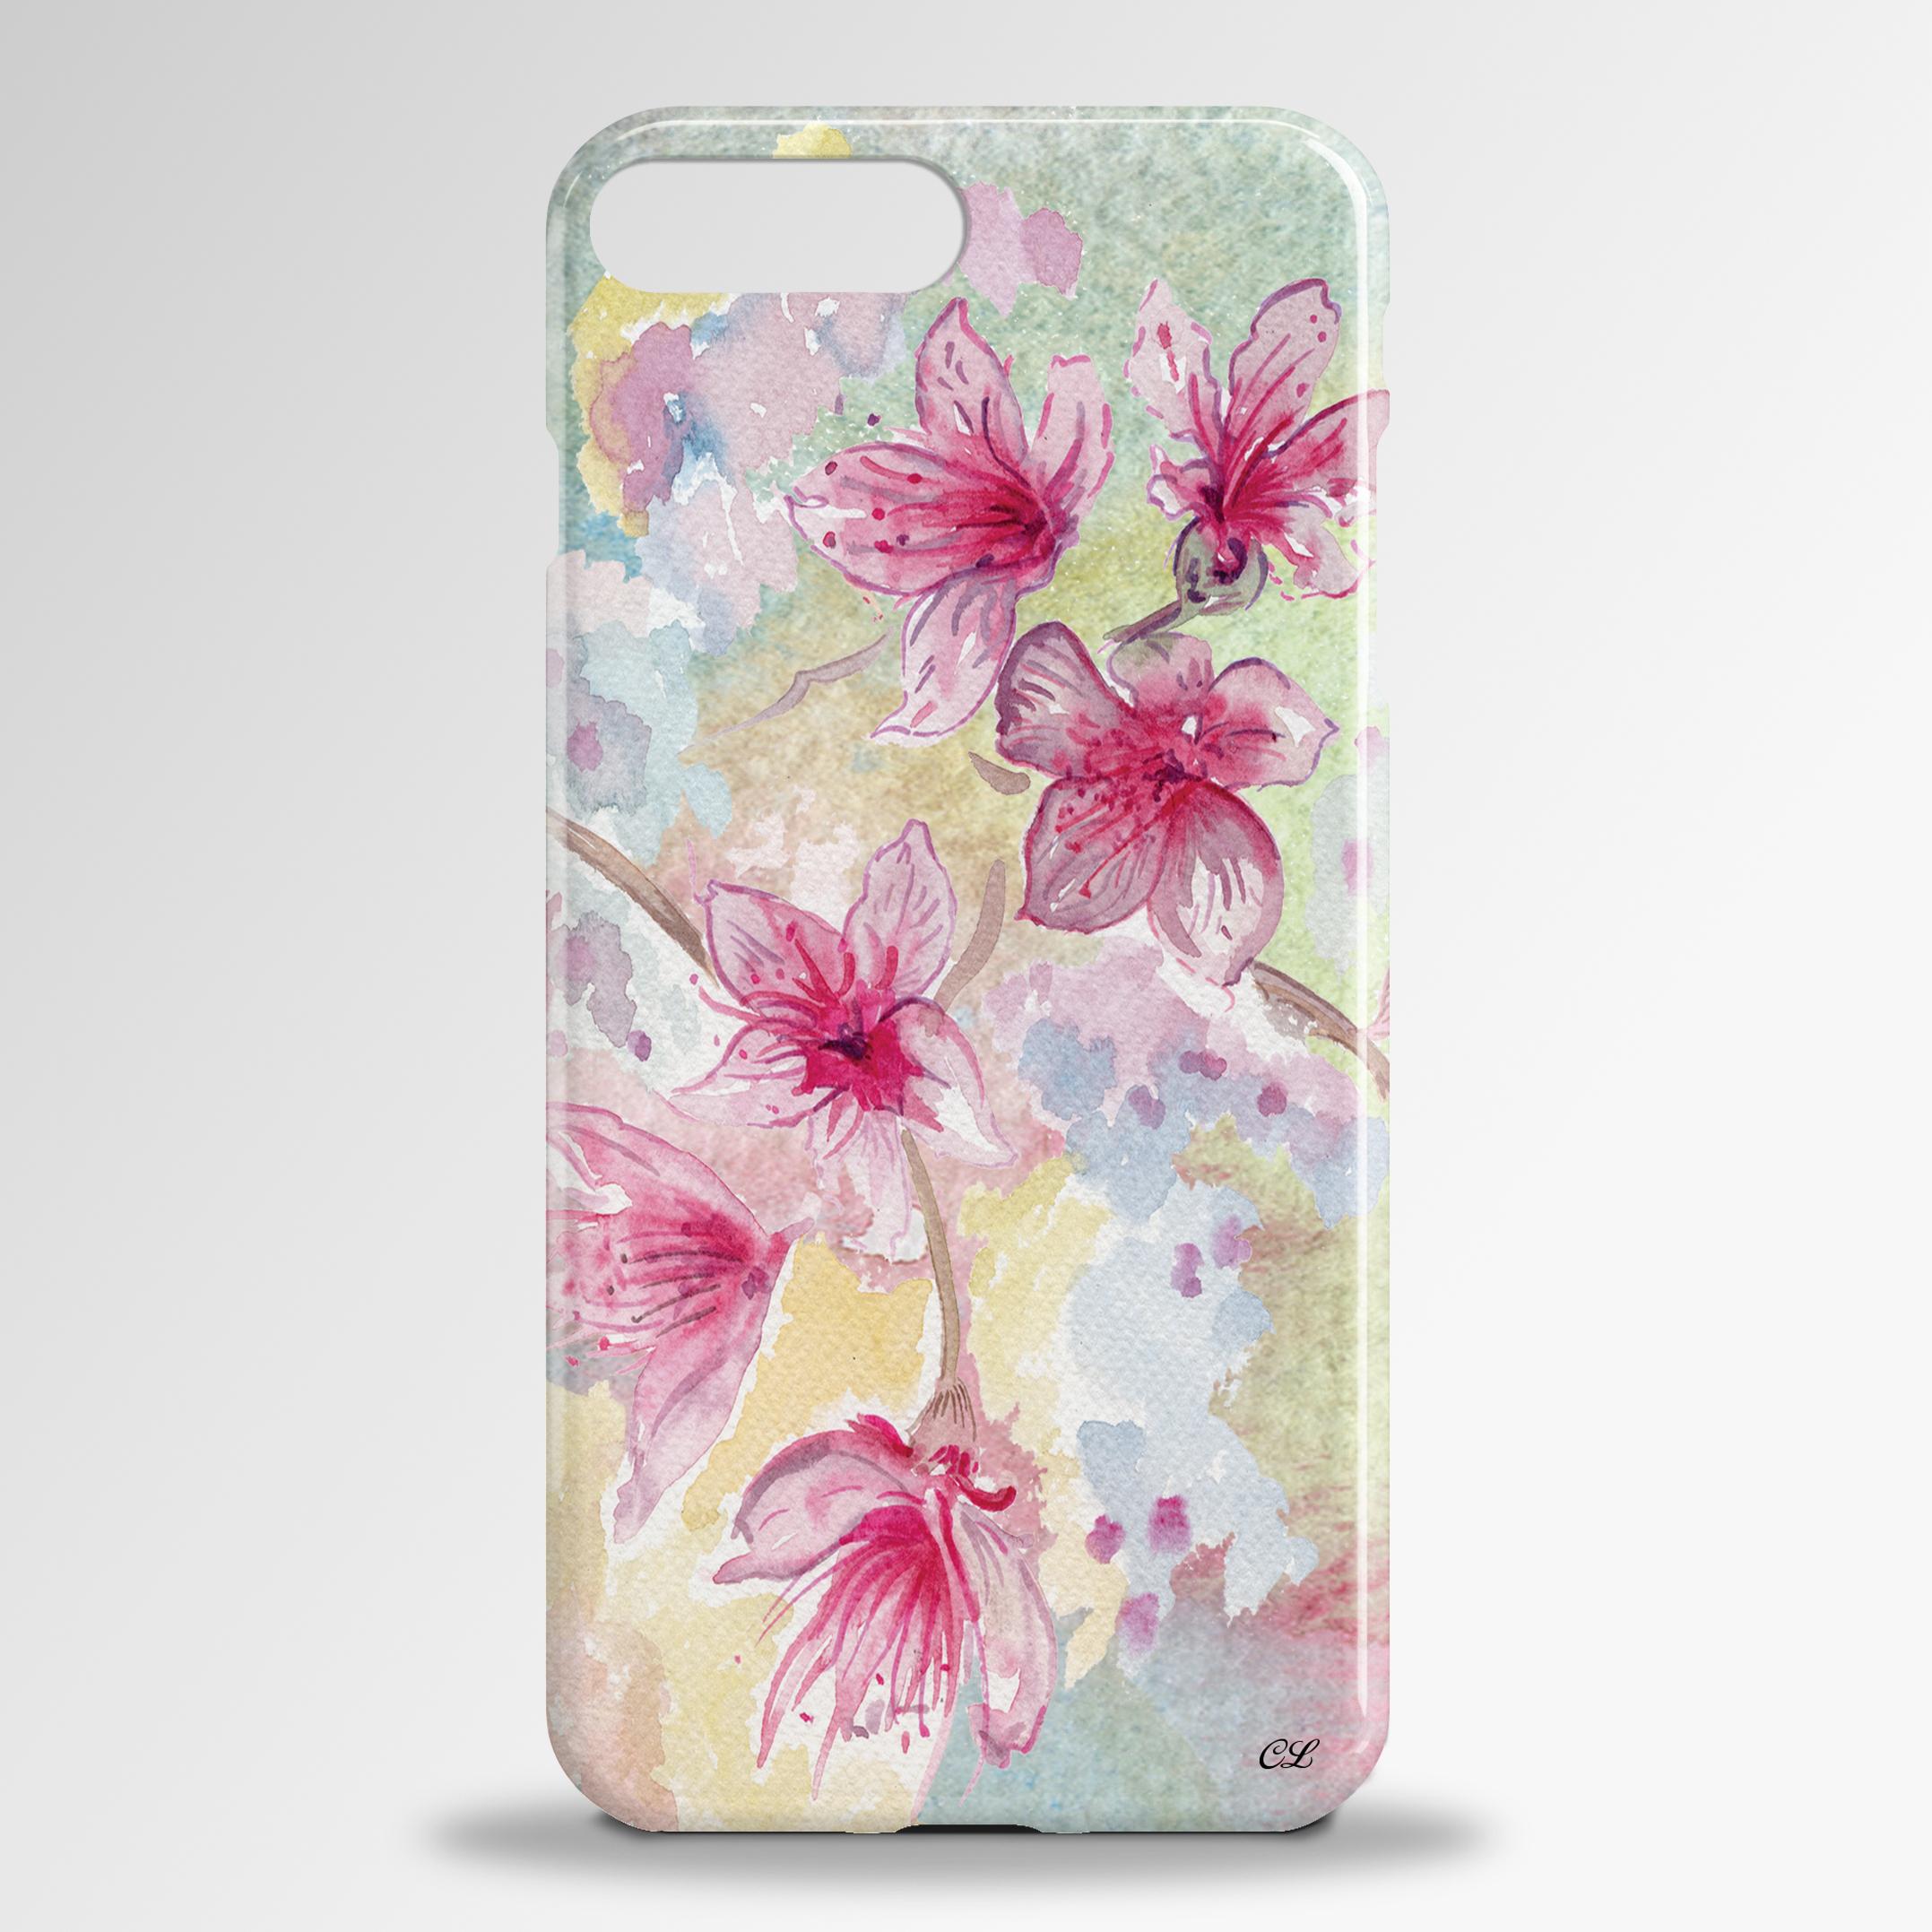 Bonbon Samsung 3D Phone Case